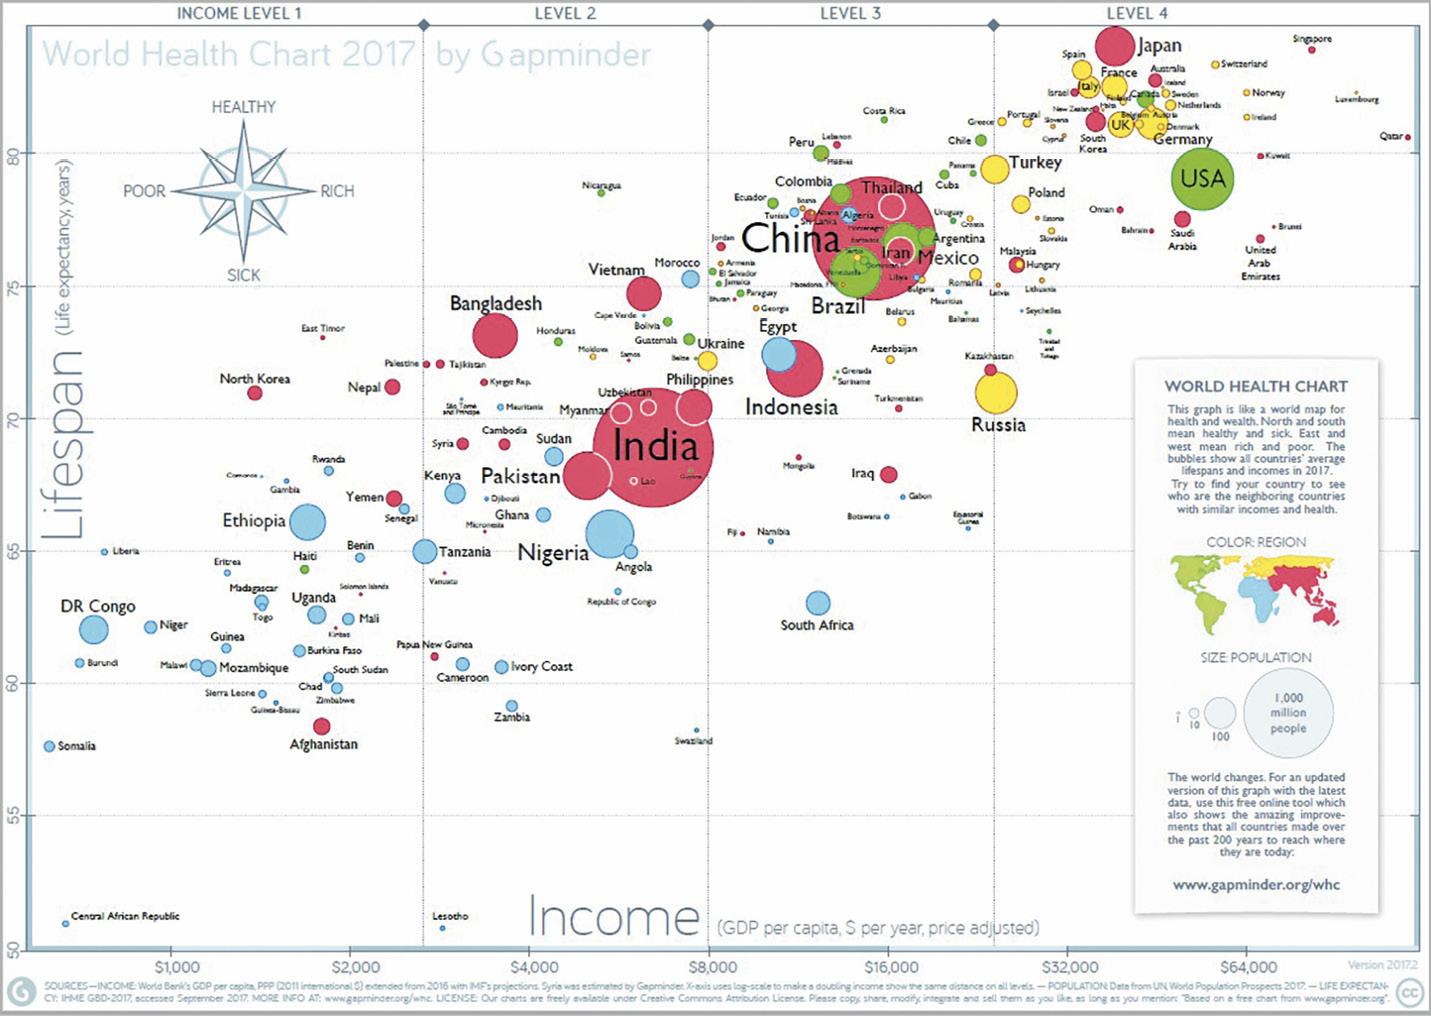 Figure 1. World Health Chart.